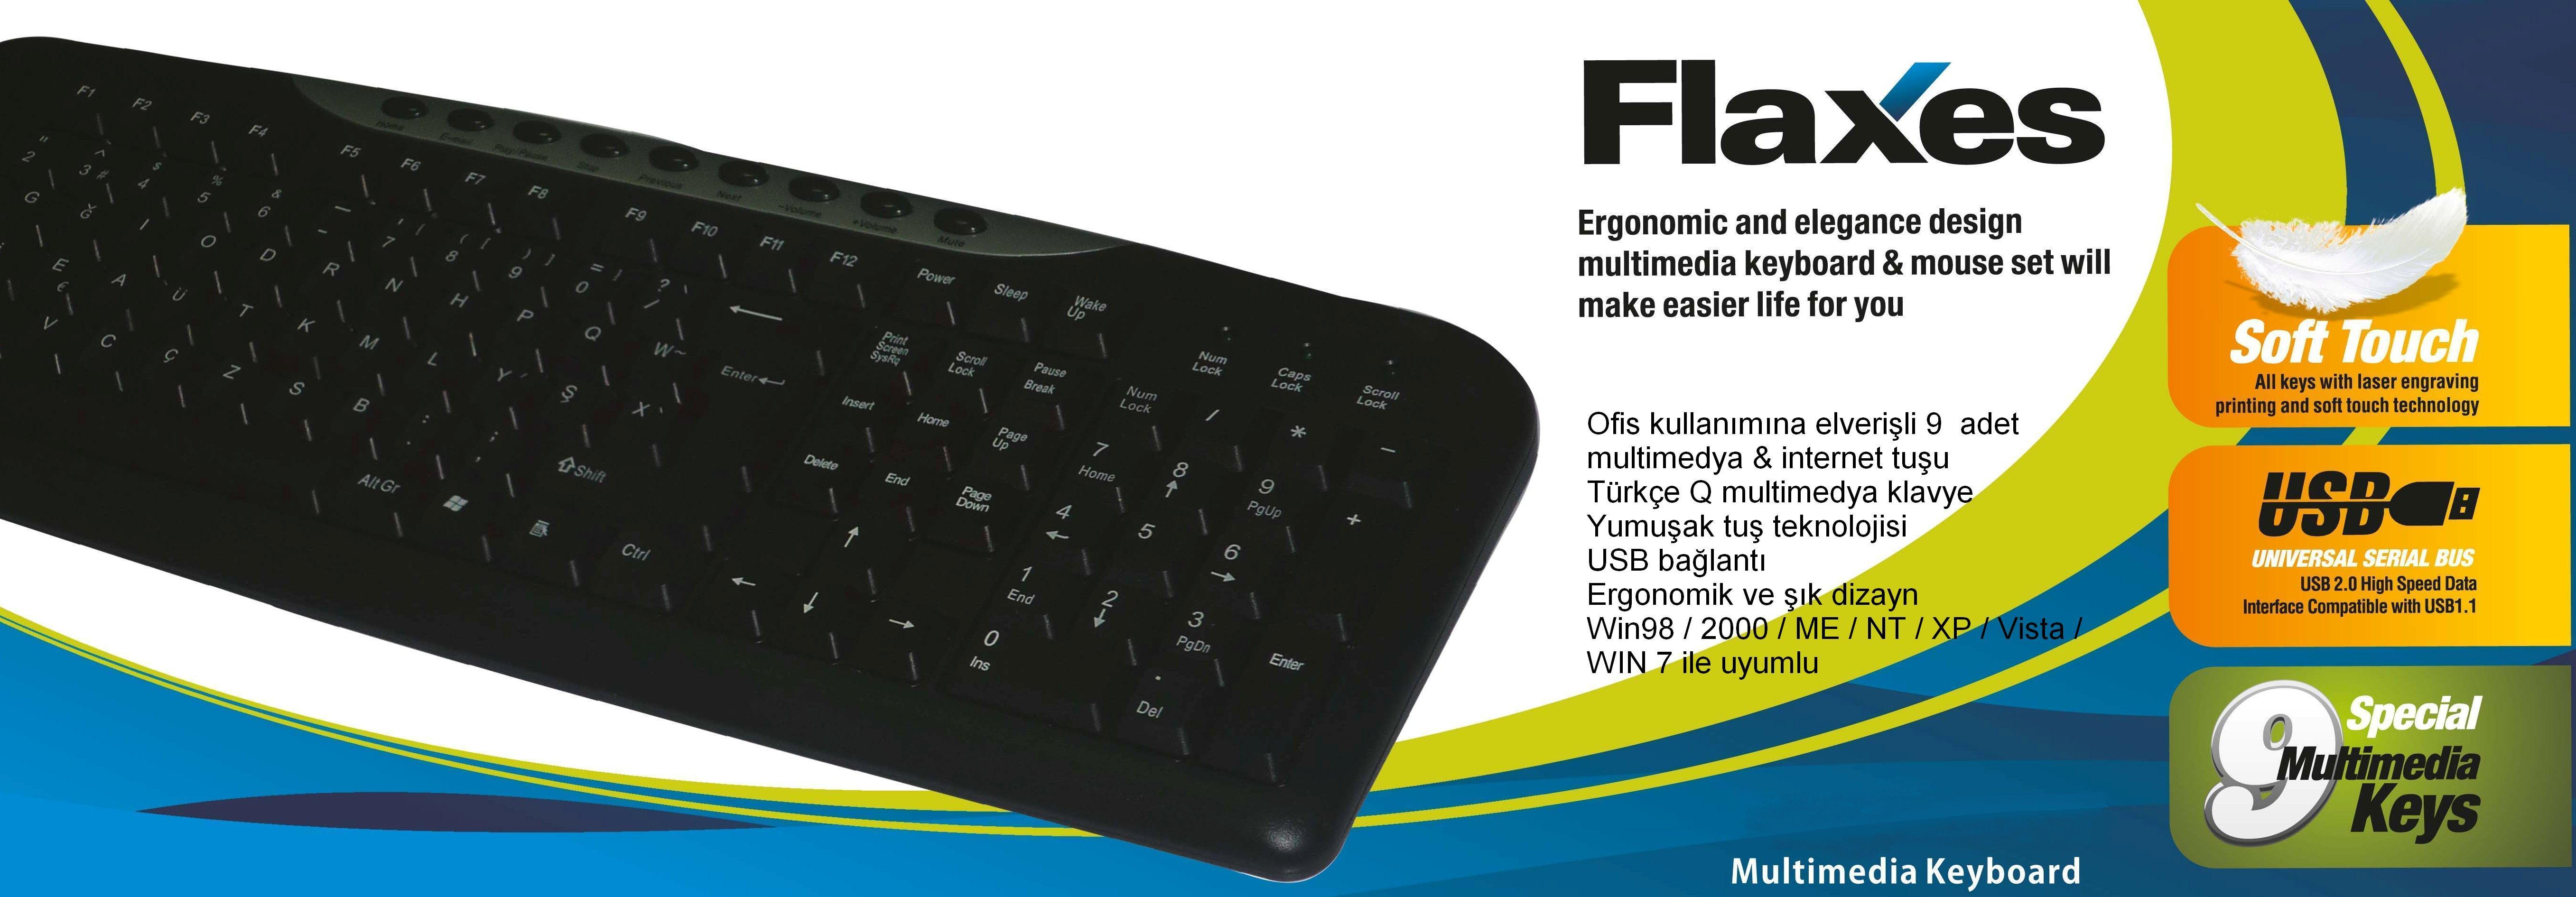 Flaxes FLX-172Q-MM Usb Multimedya Q TR Kablolu Klavye